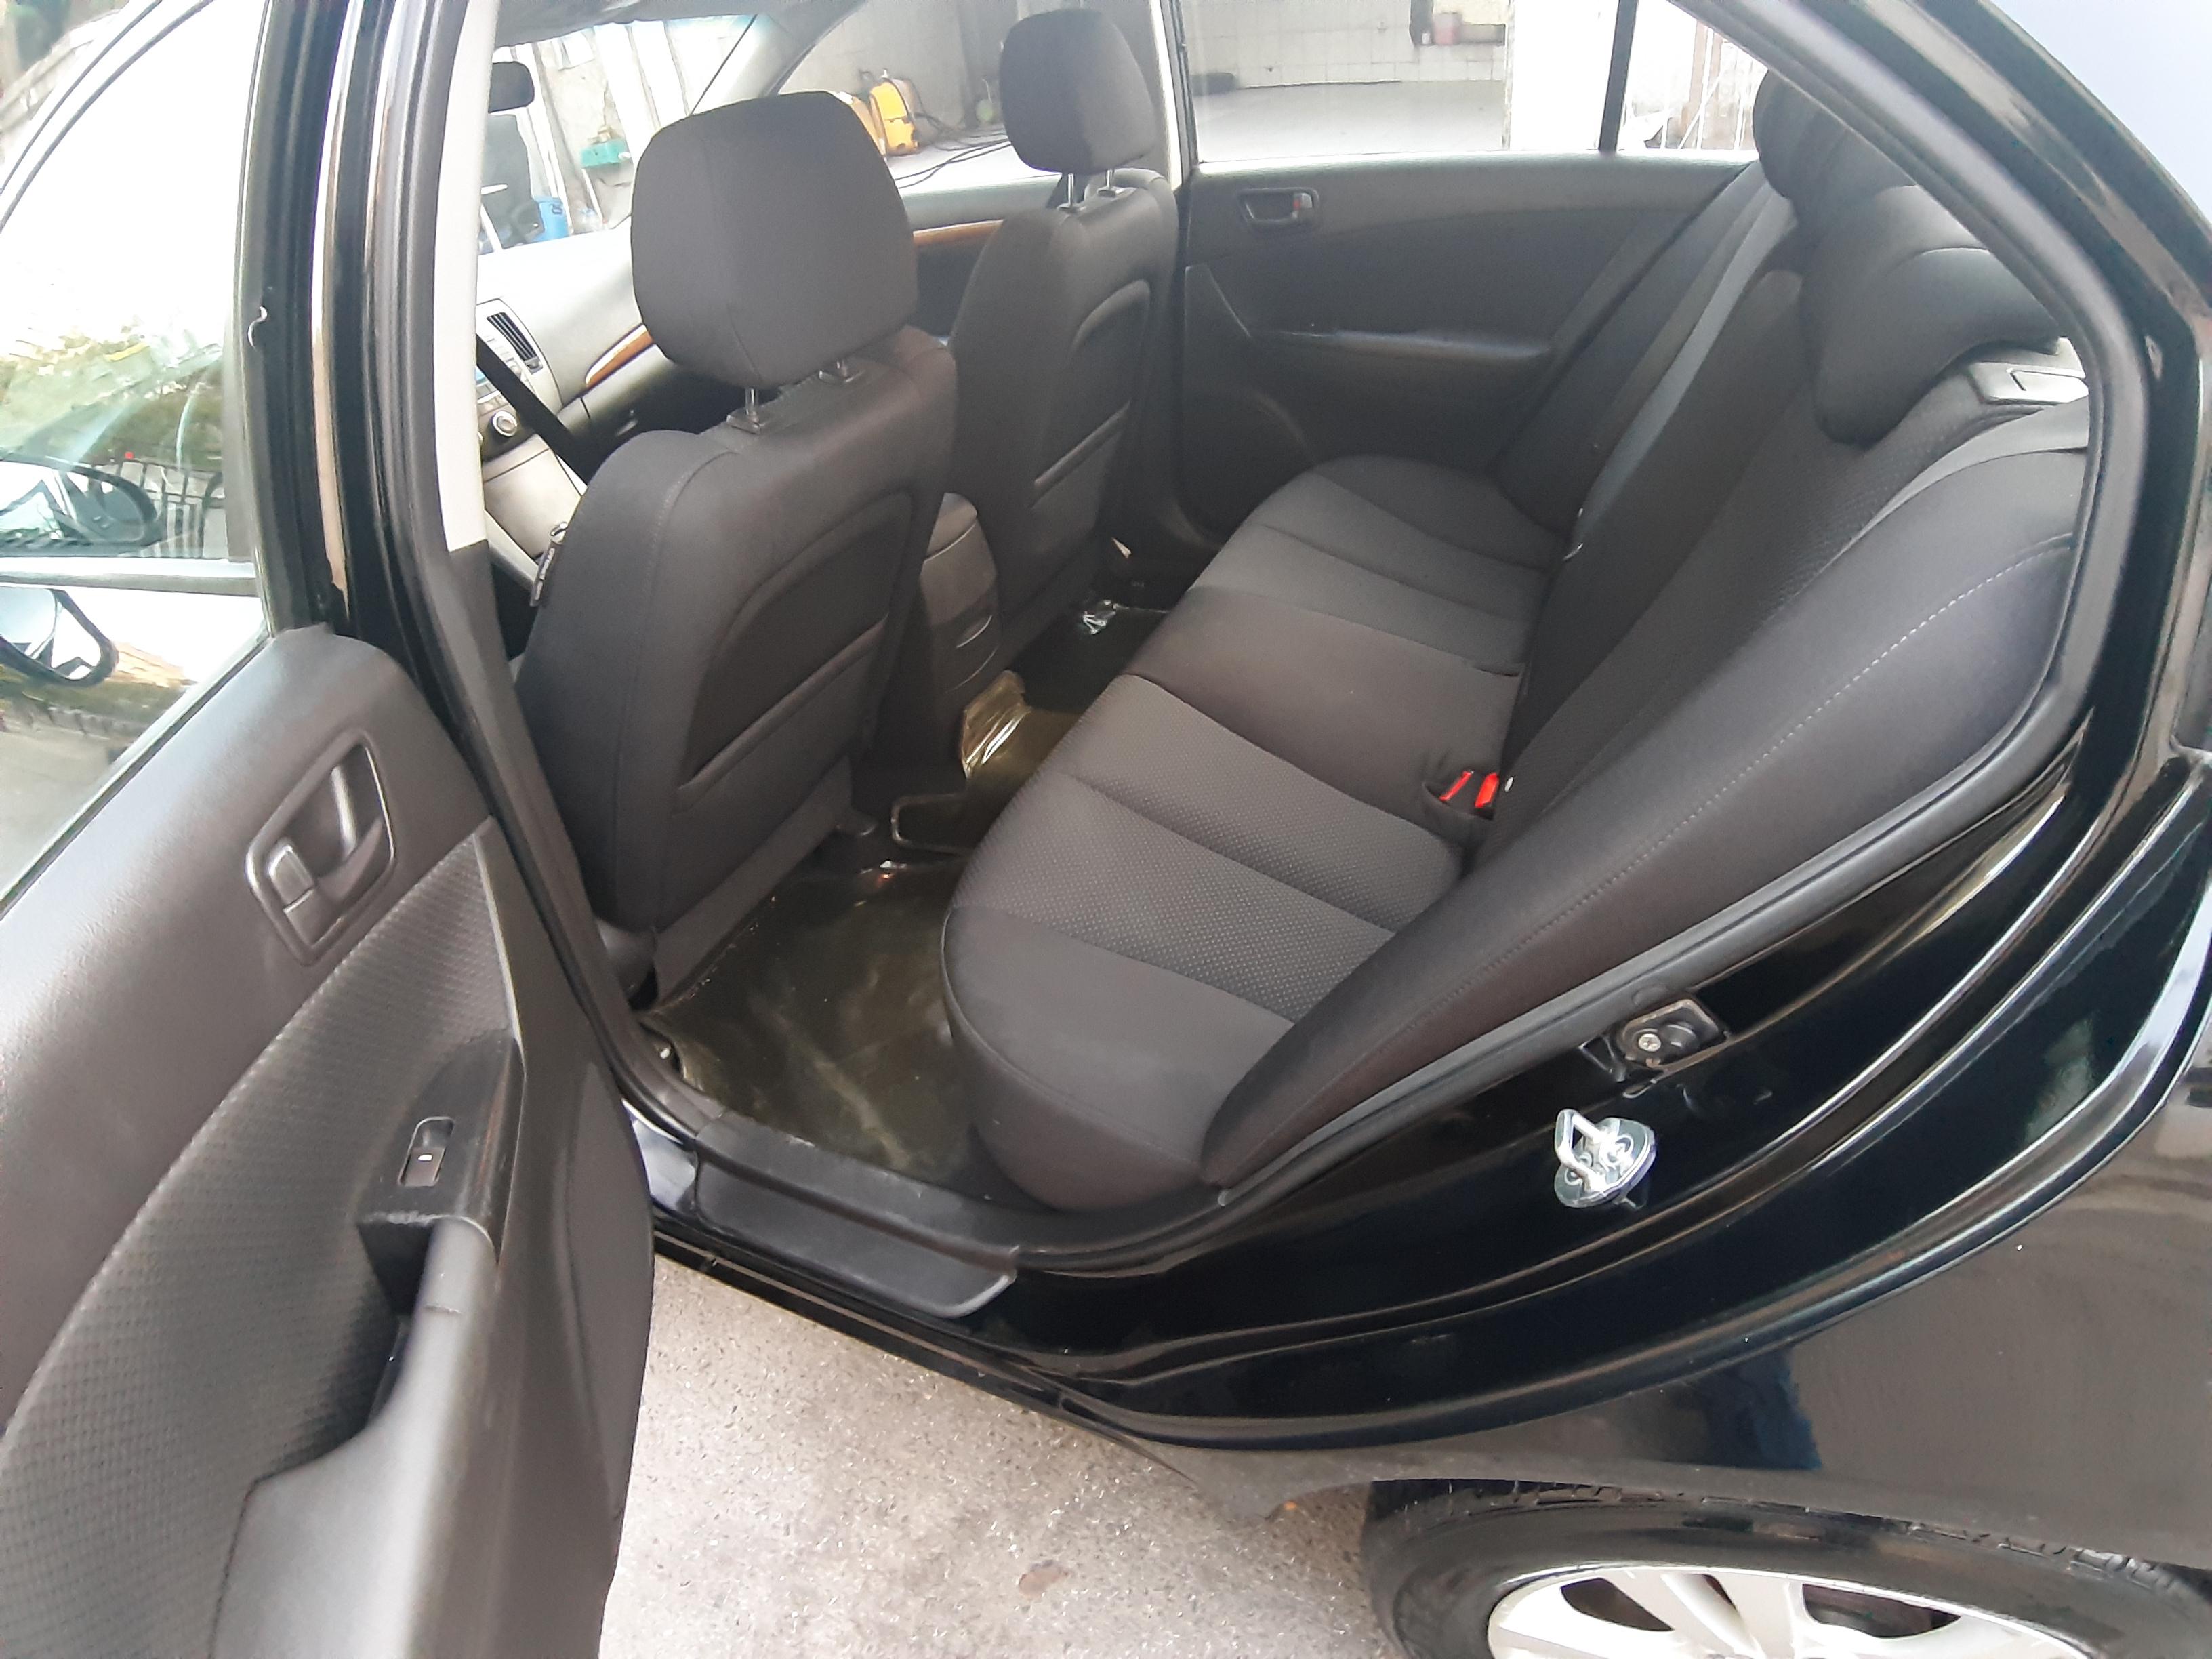 Hyundai Sonata 2.0(lt) 2008 İkinci əl  $9500